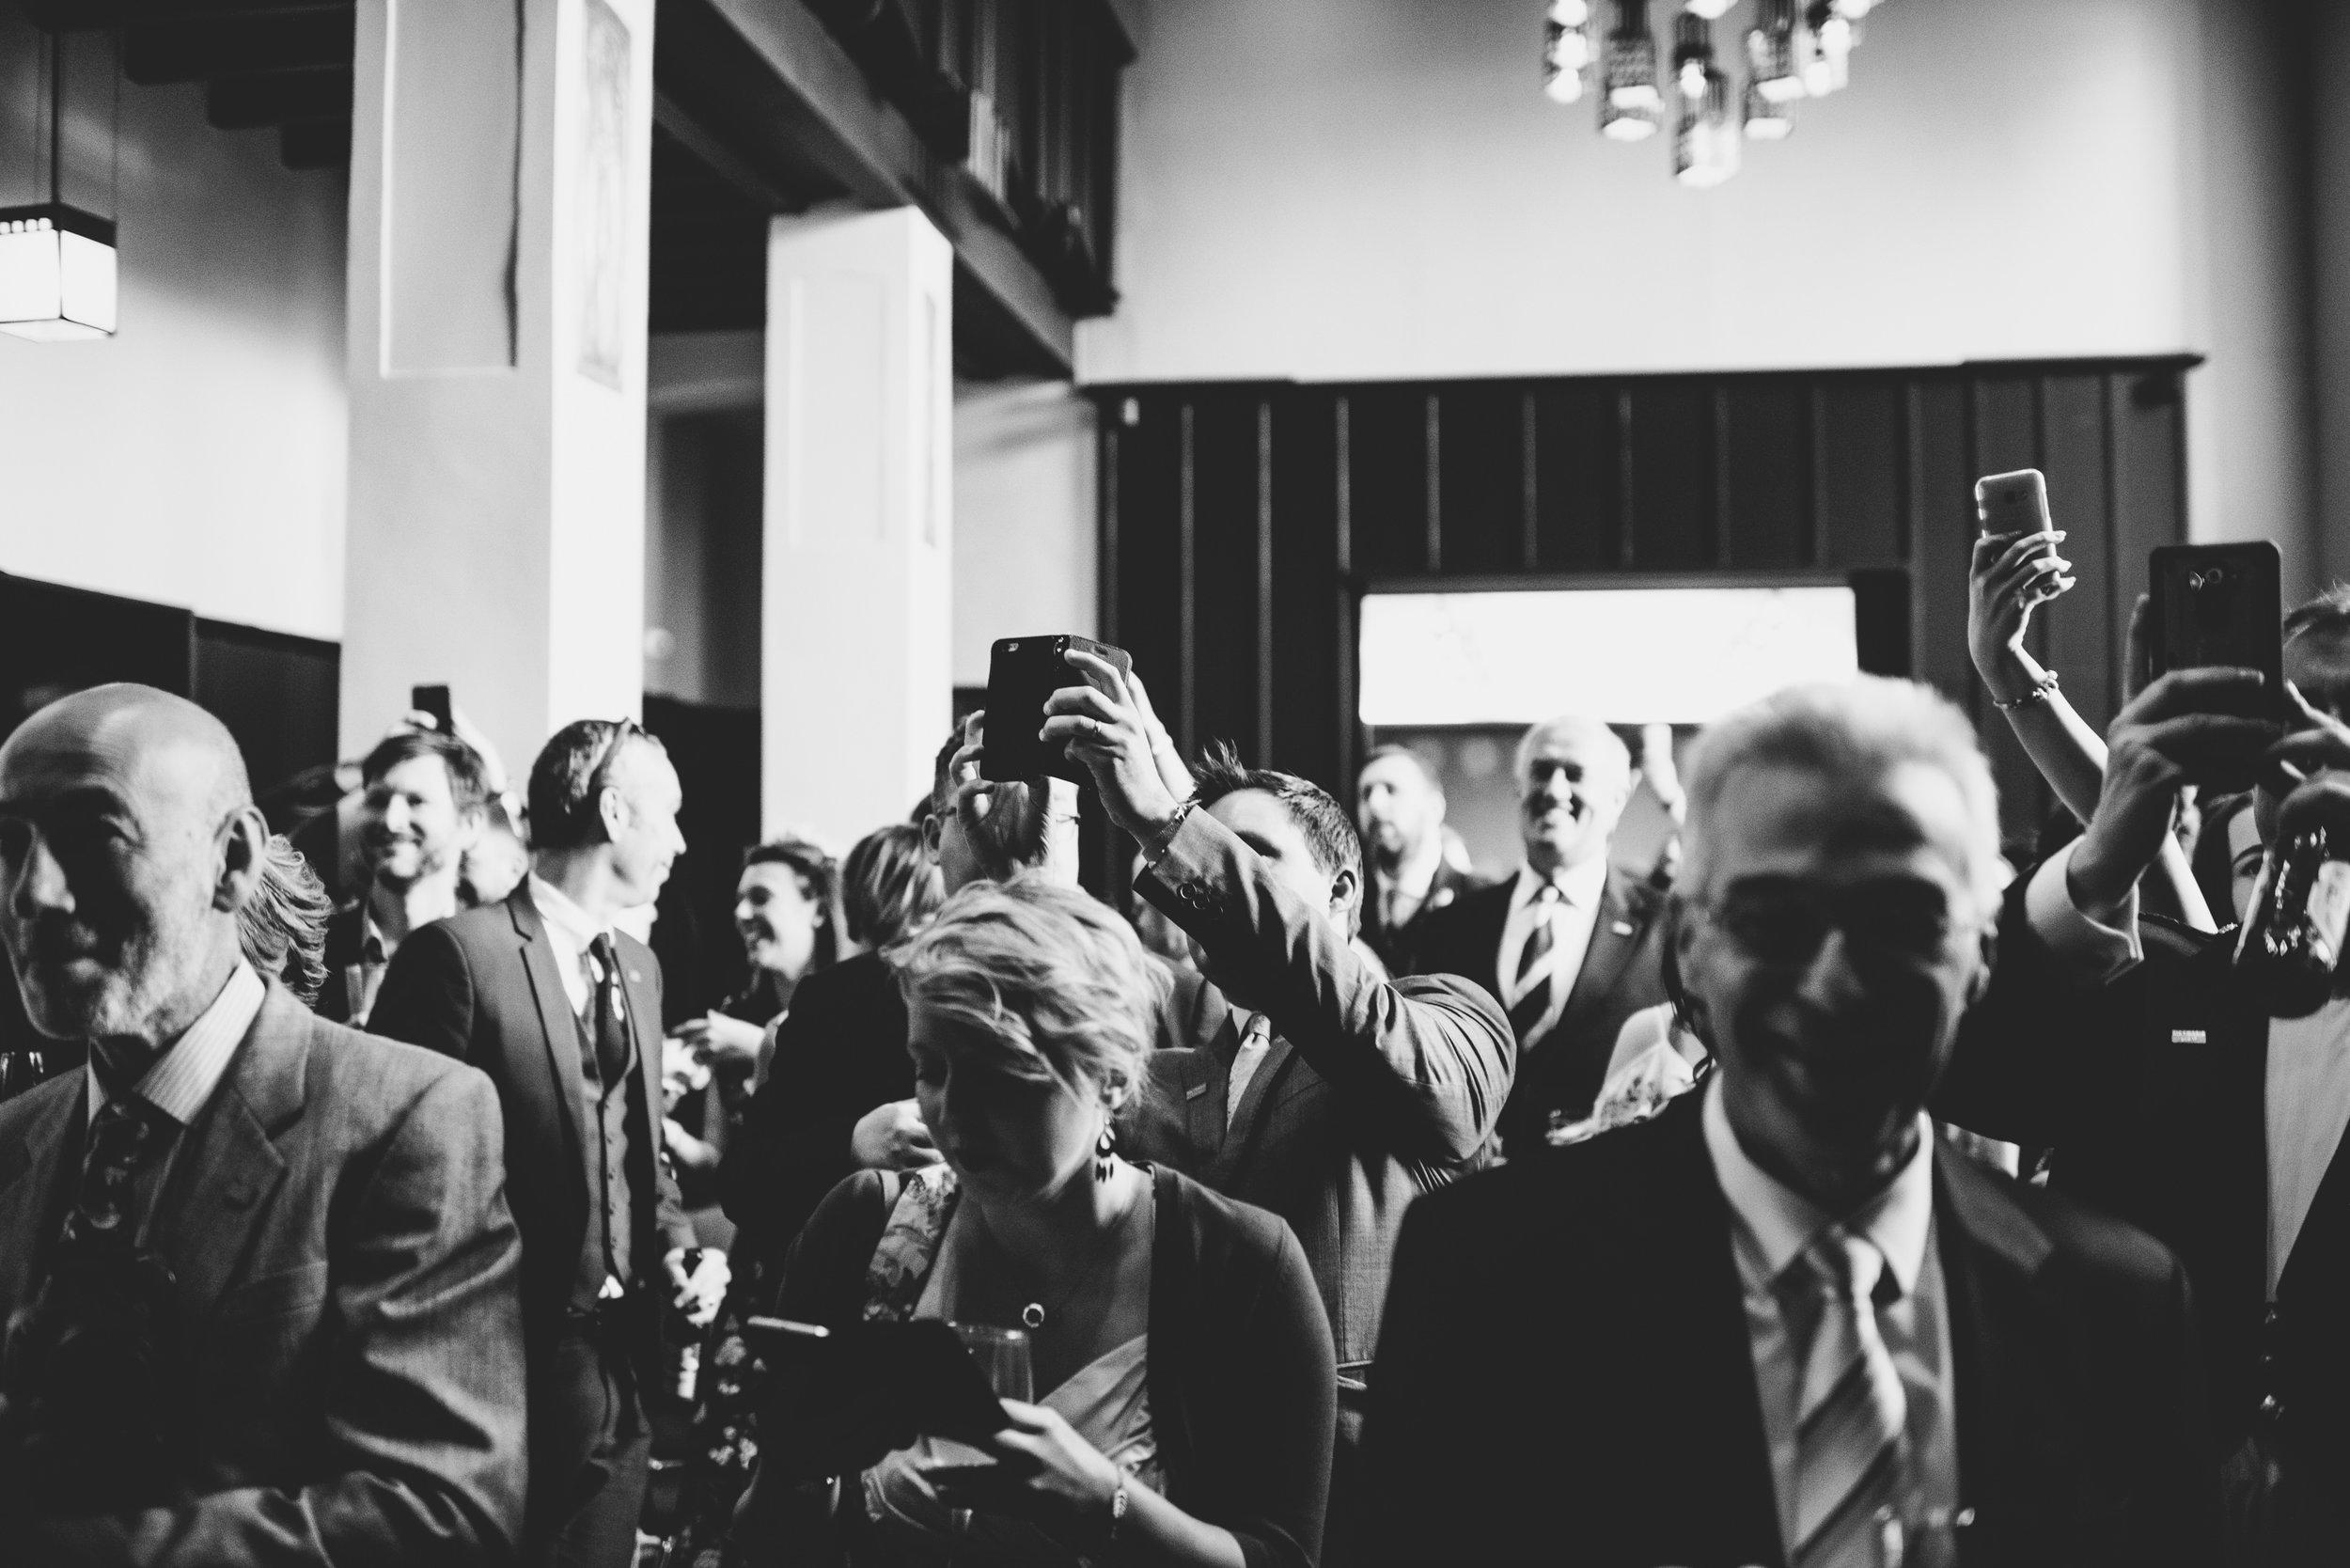 0224-LISA-DEVINE-PHOTOGRAPHY-ALTERNATIVE-WEDDING-PHOTOGRAPHY-SCOTLAND-DESTINATION-WEDDINGS-GLASGOW-WEDDINGS-COOL-WEDDINGS-STYLISH-WEDDINGS.JPG